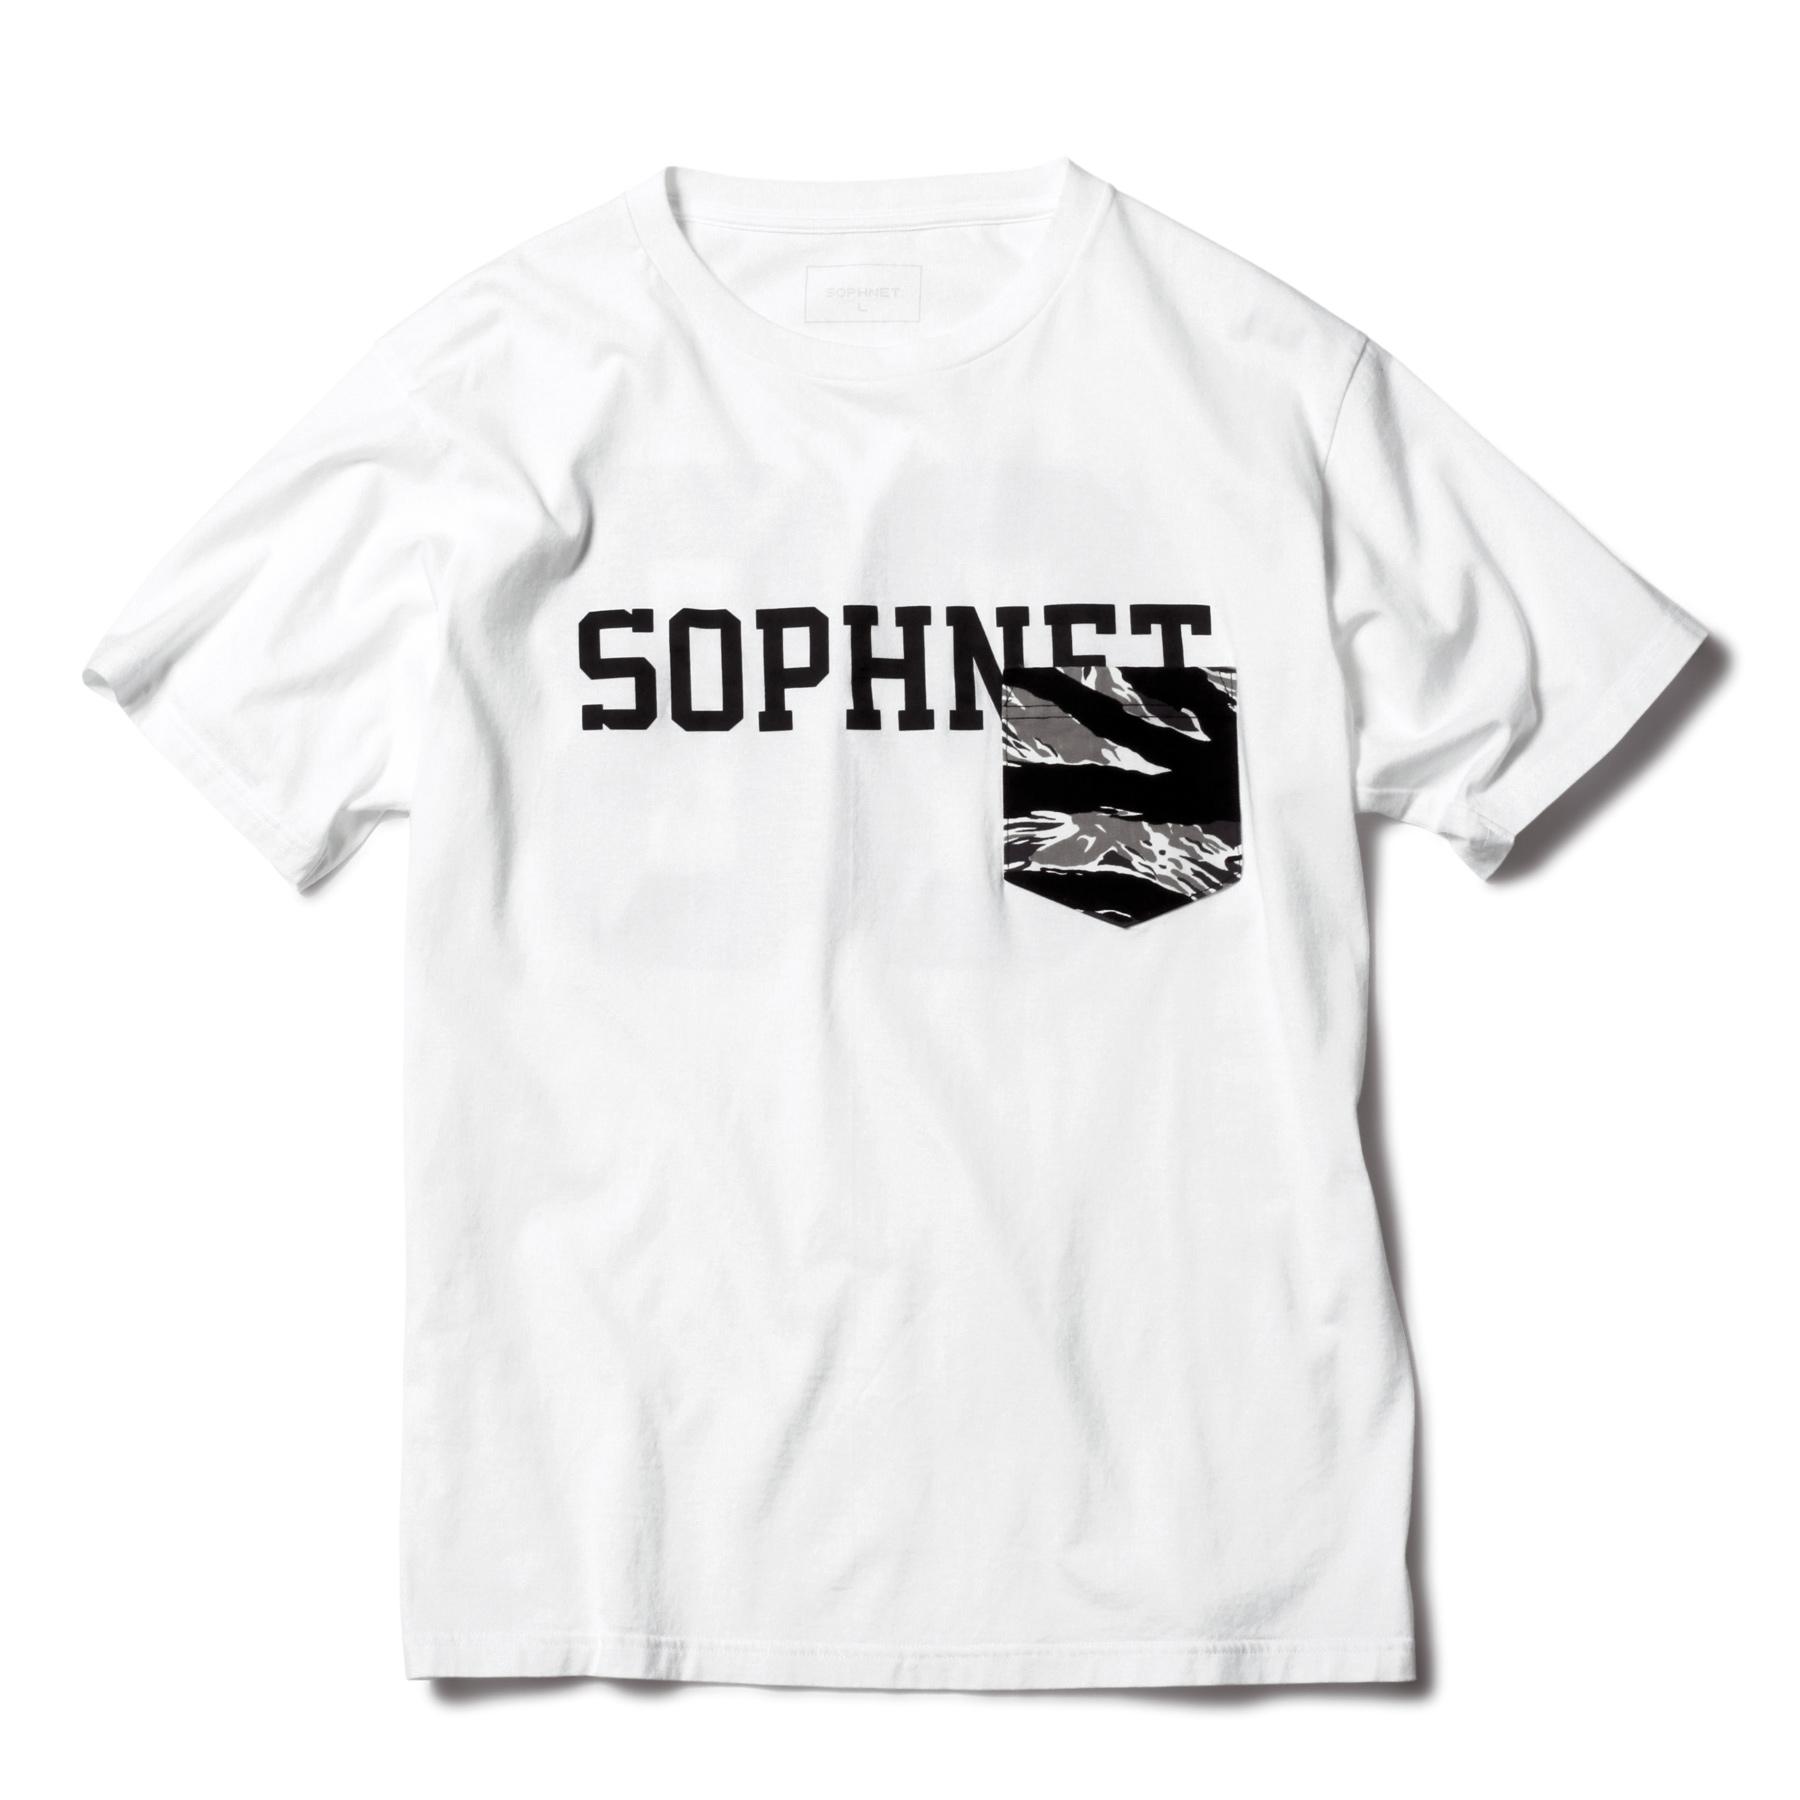 SOPHNET. / CAMOUFLAGE POCKET TEE -white